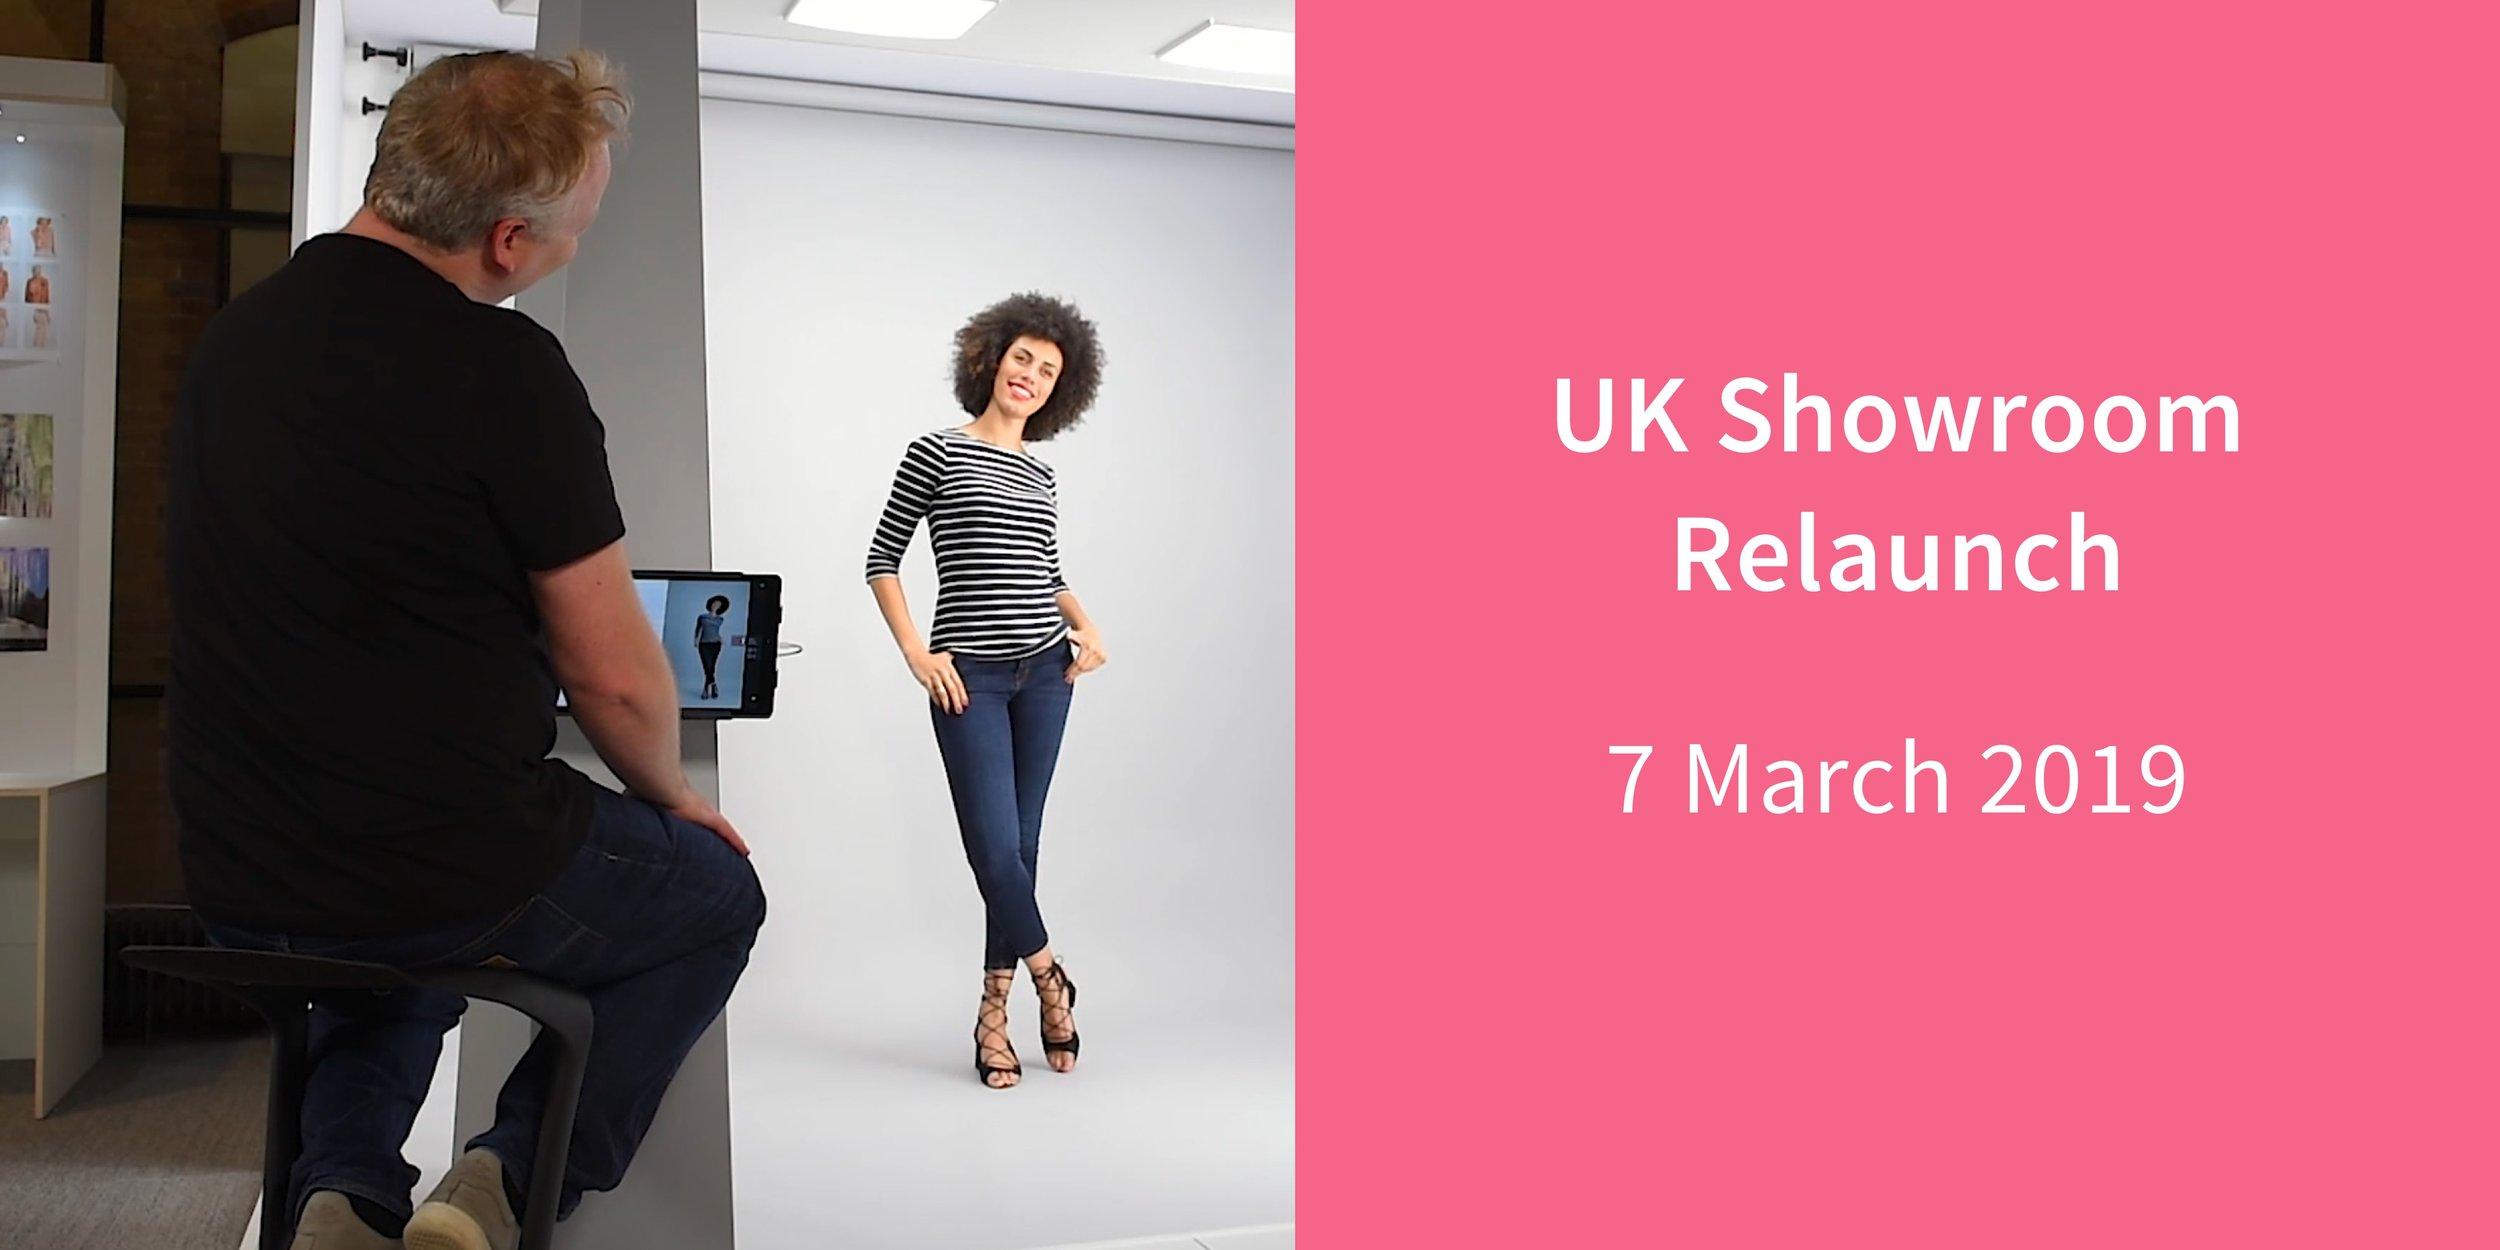 uk-showroom-relaunch-event-header.jpg